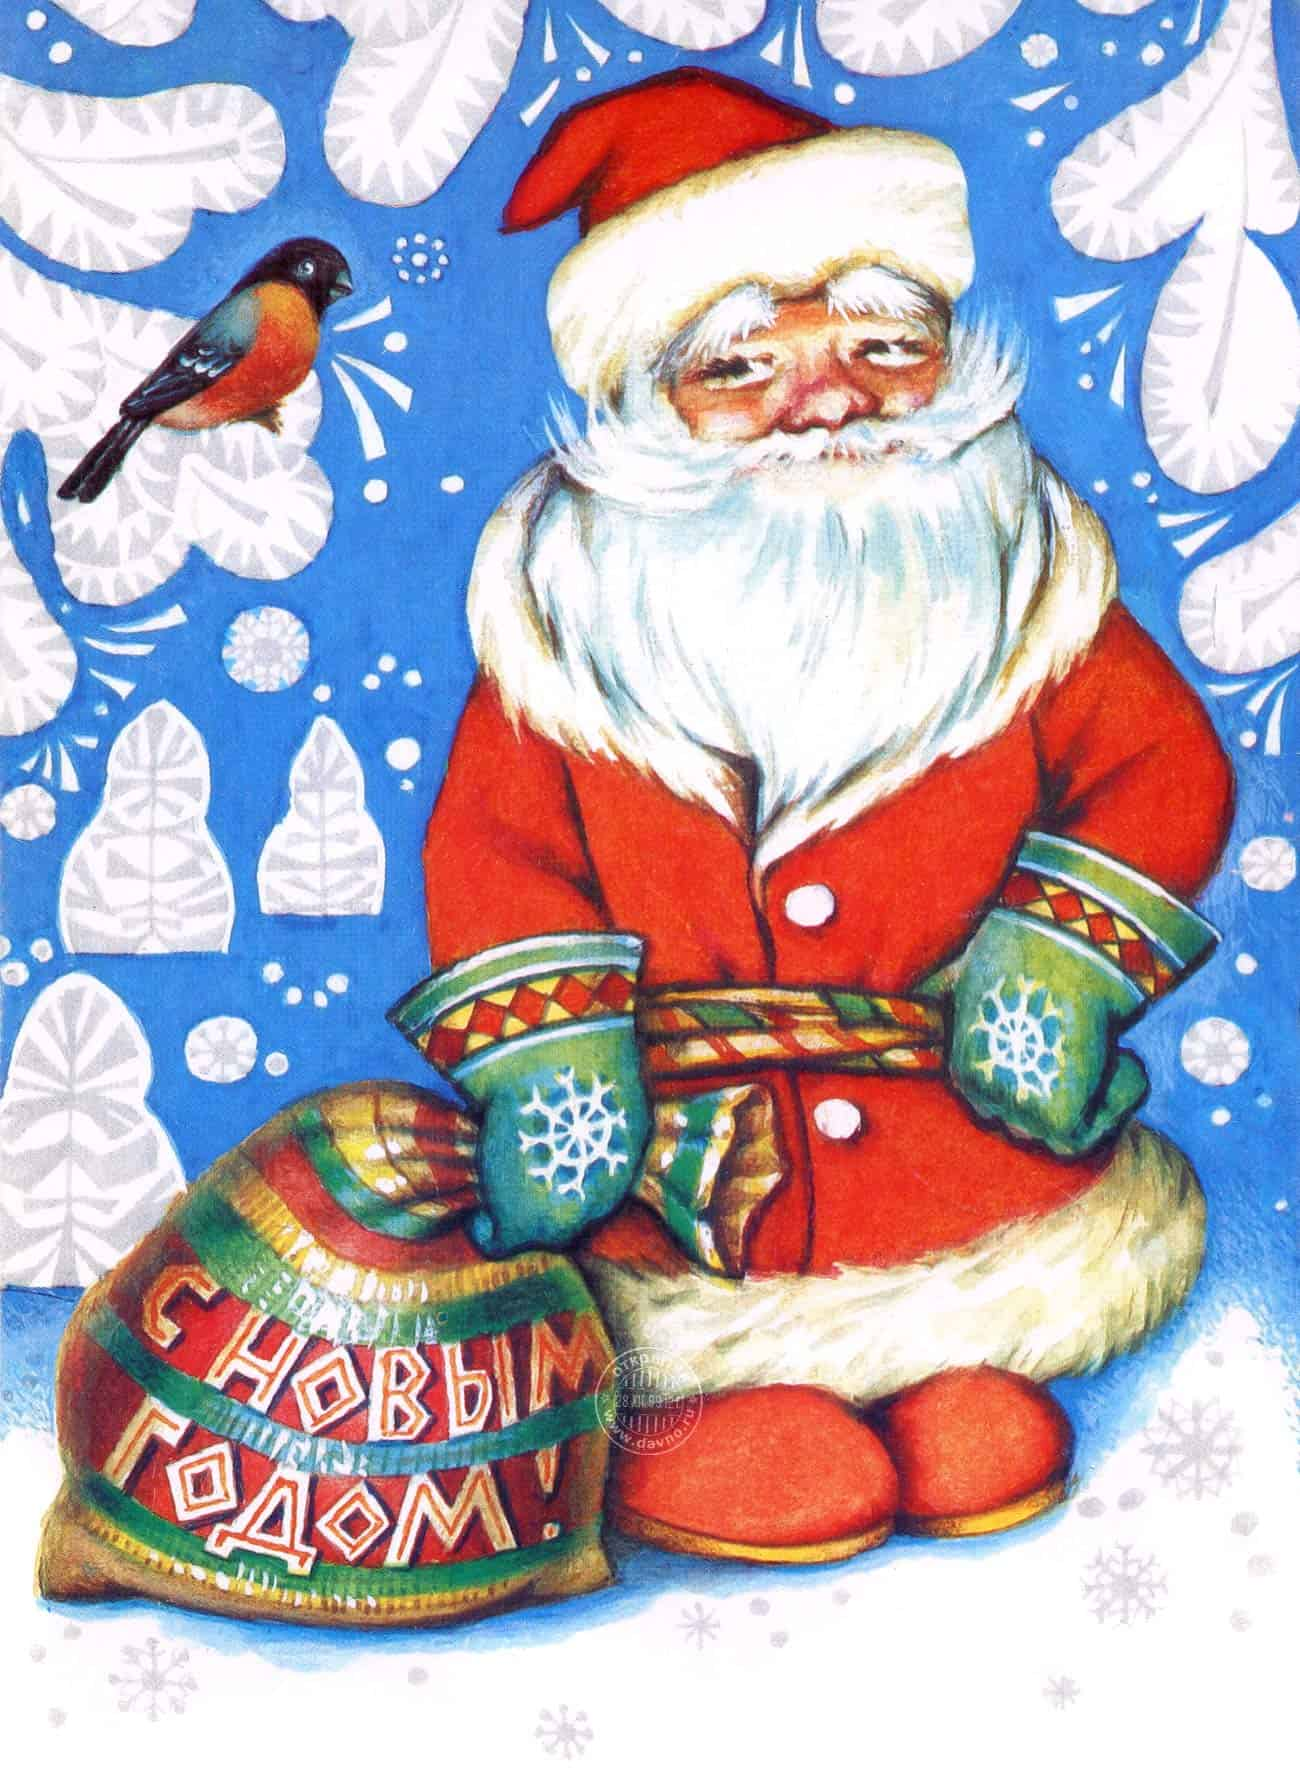 Skazka_pro_novogodnee_priklyuchenie_Deda_Moroza 1